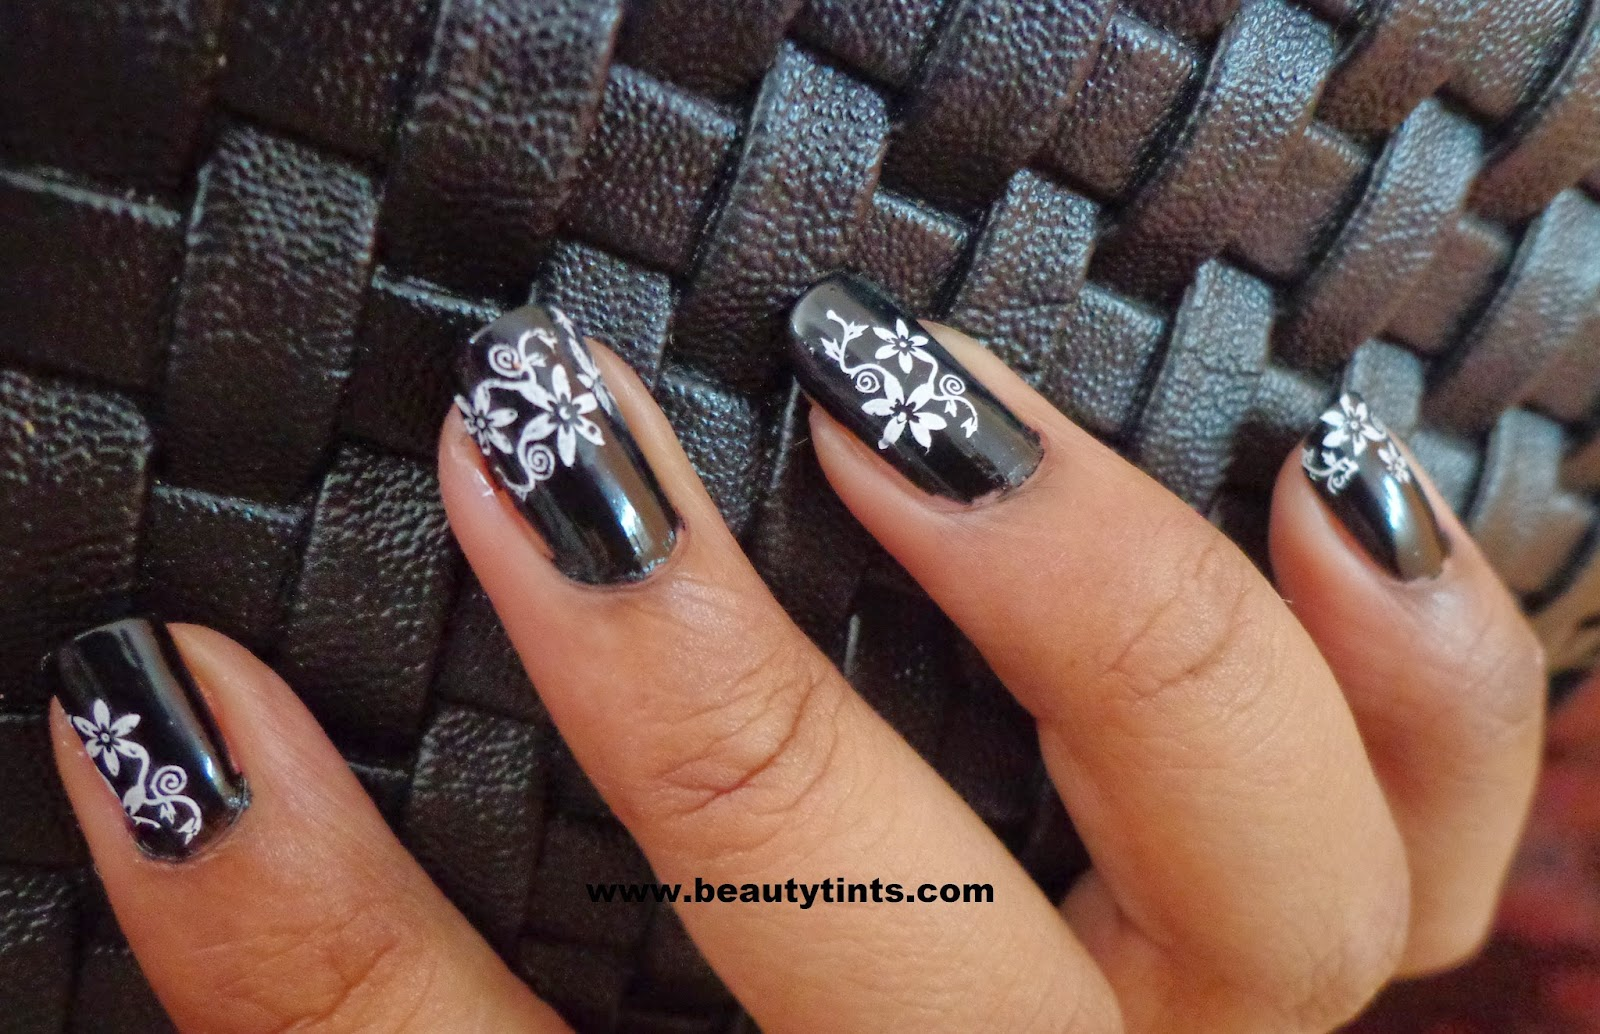 Sriz Beauty Blog: Konad Stamping Nail Art Promotion Kit Review and ...